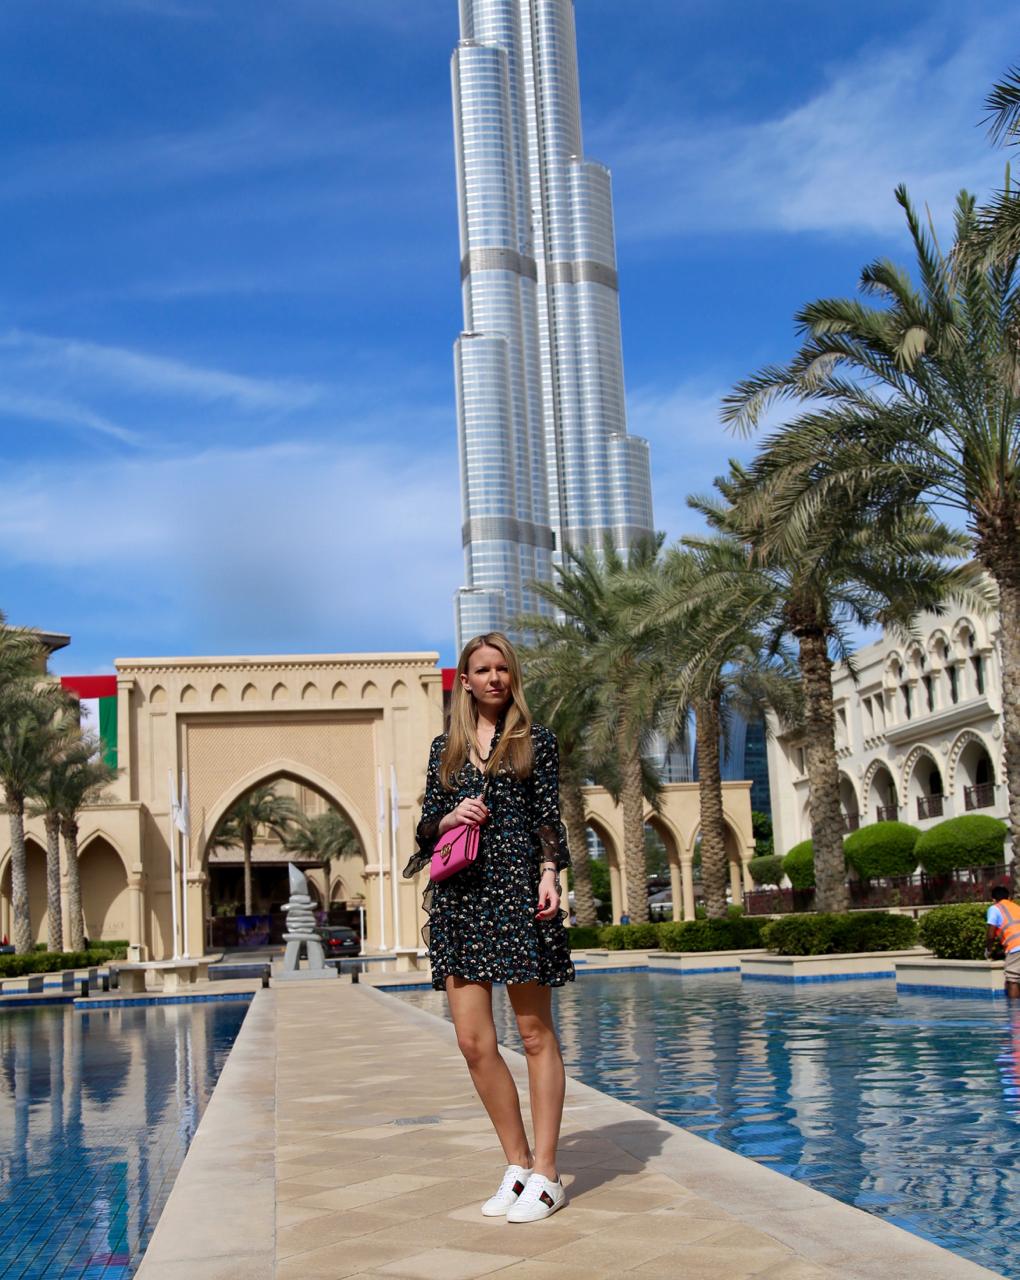 Dubai Herbstoutfit mit Gucci Accessoires und Kleid mit Blumenprint Zara Fashion Outfit Herbst Jenni PepperAndGold Sneakes Heels HighHeels Palace Downtown Hotel BurjKhalifa AtTheTop JettyLoung Bussola TheWestin